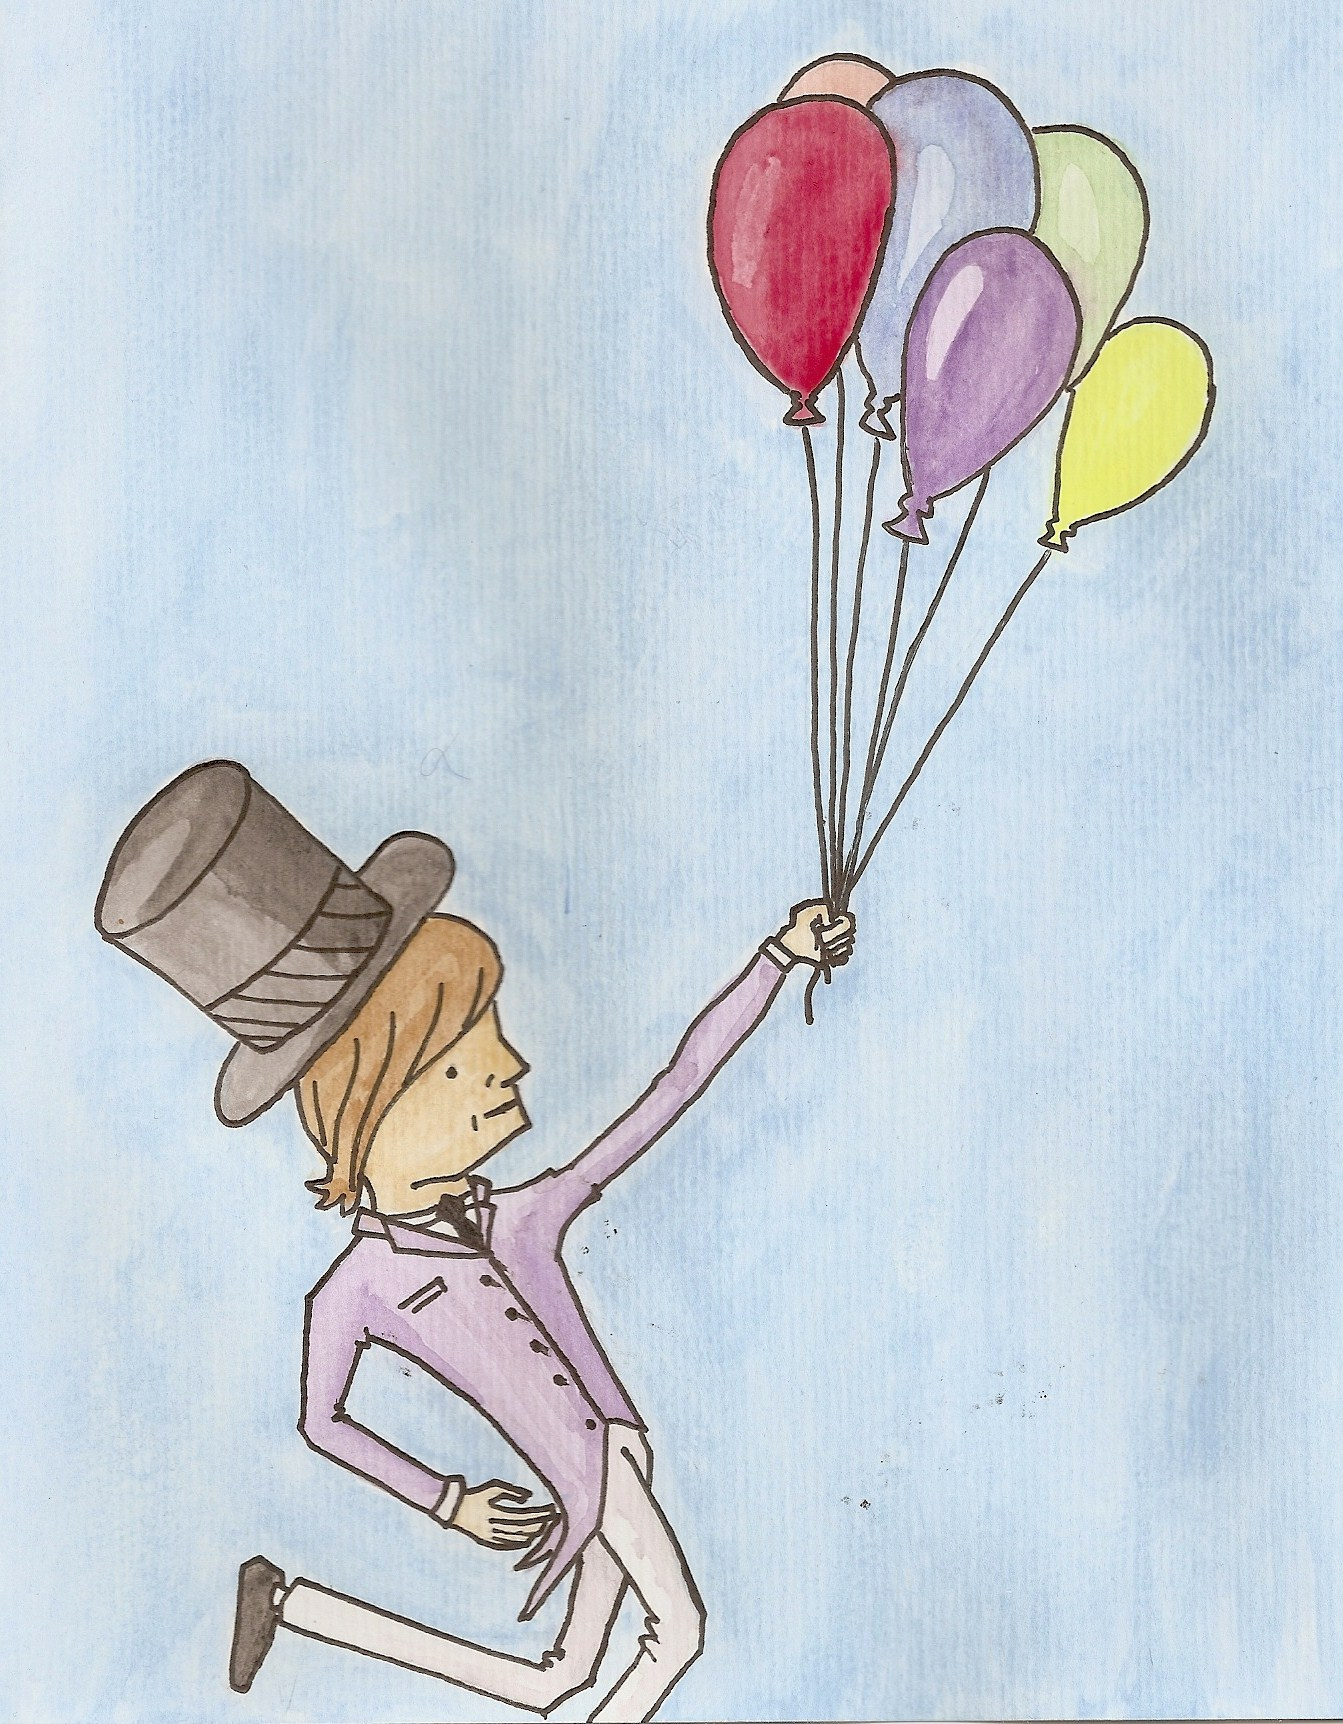 ye olde balloone man